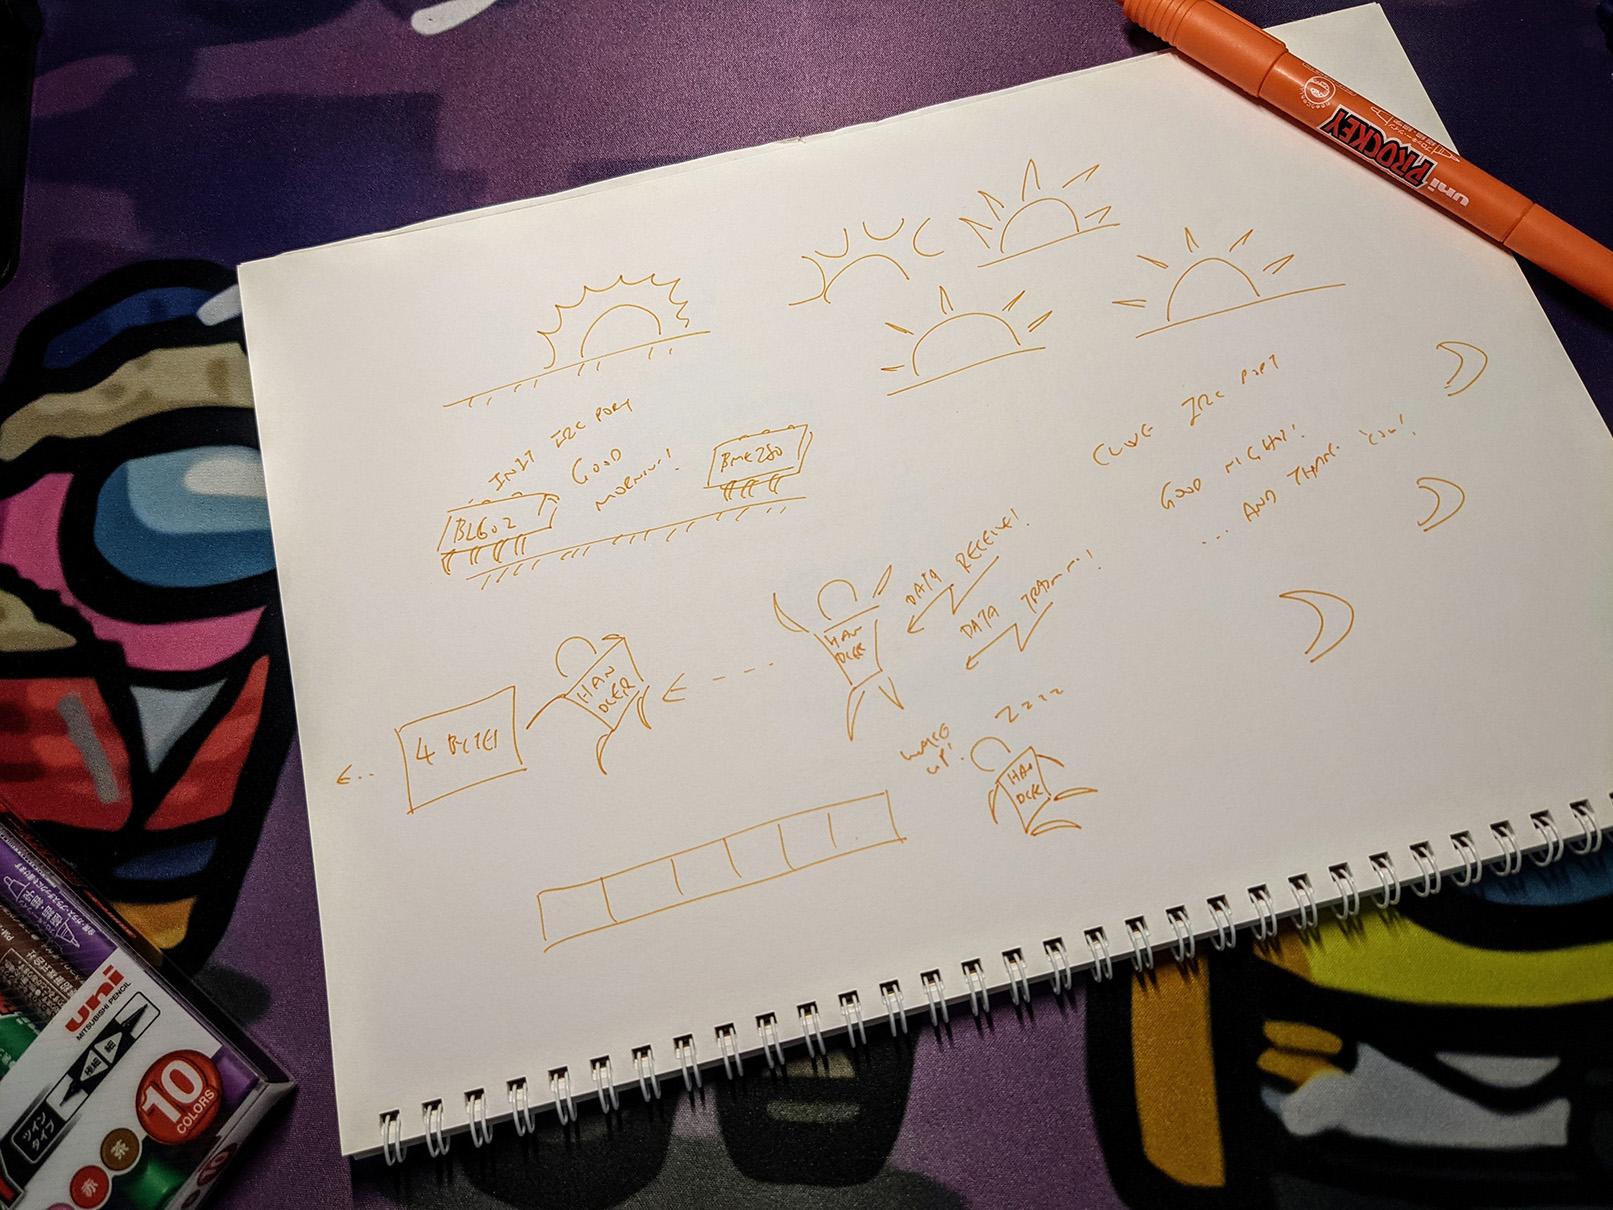 Sketching I2C cartoons